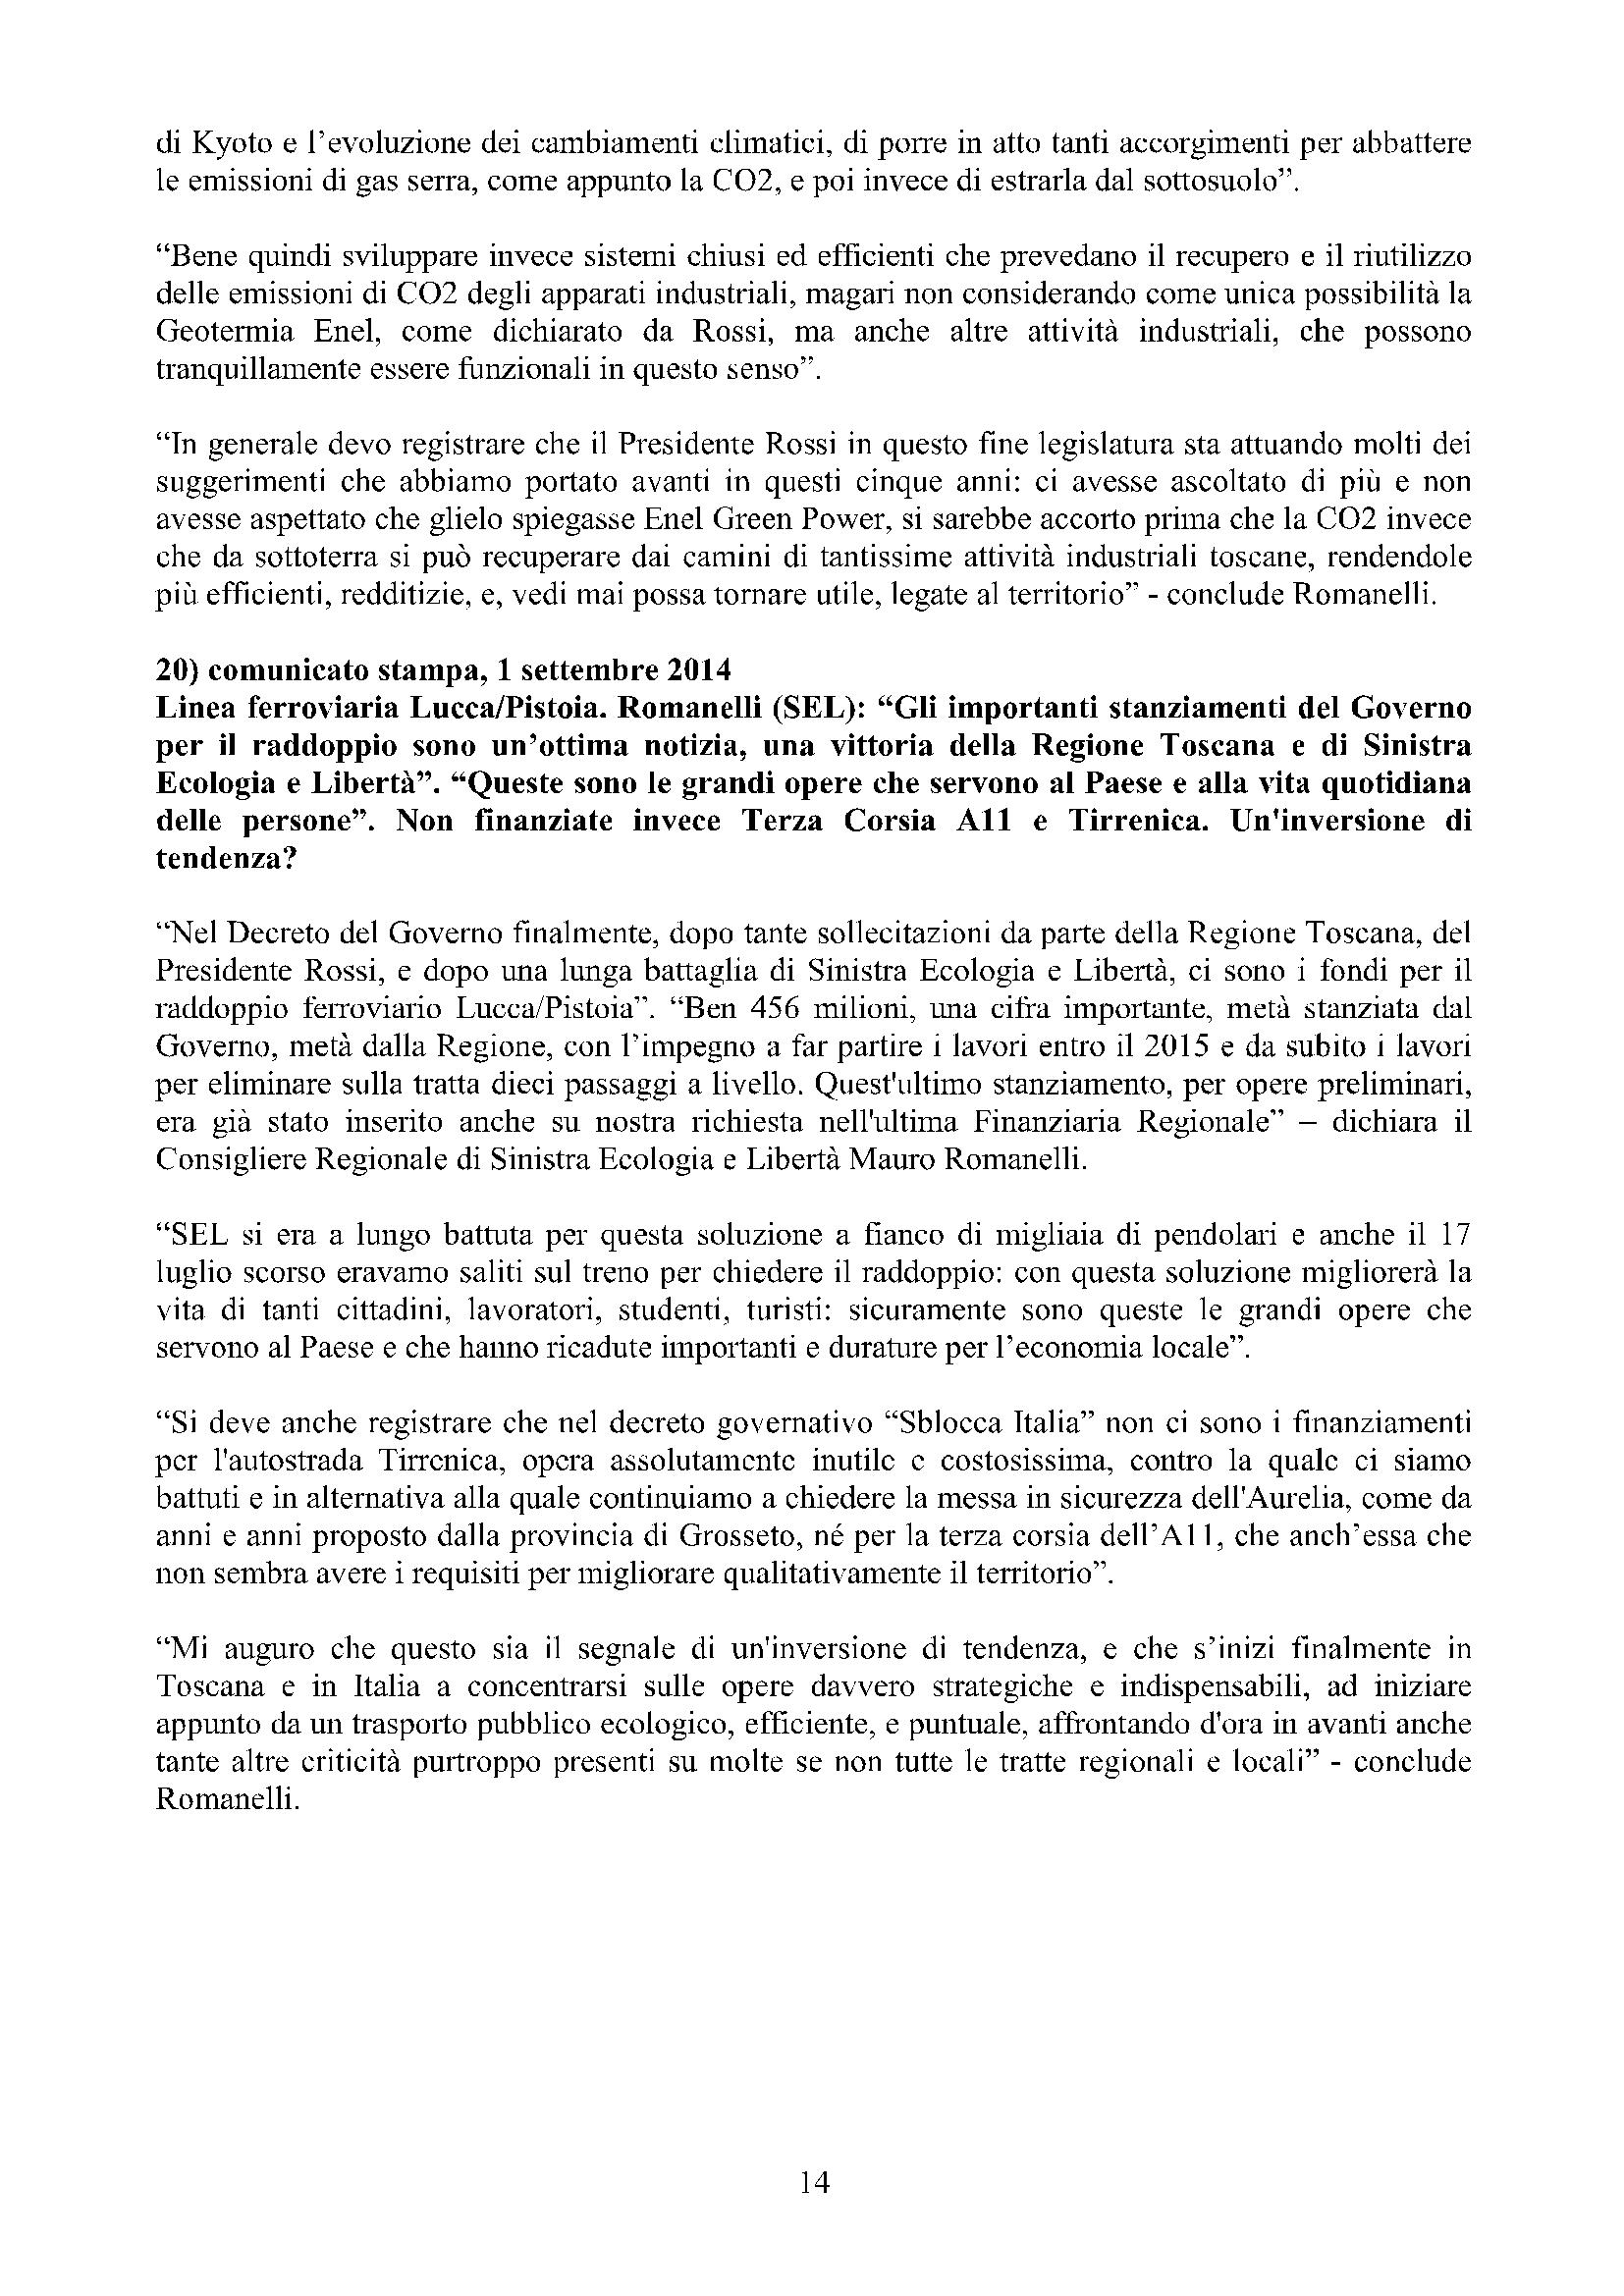 Newsletter di MAURO ROMANELLI Ottobre 2014 – 14